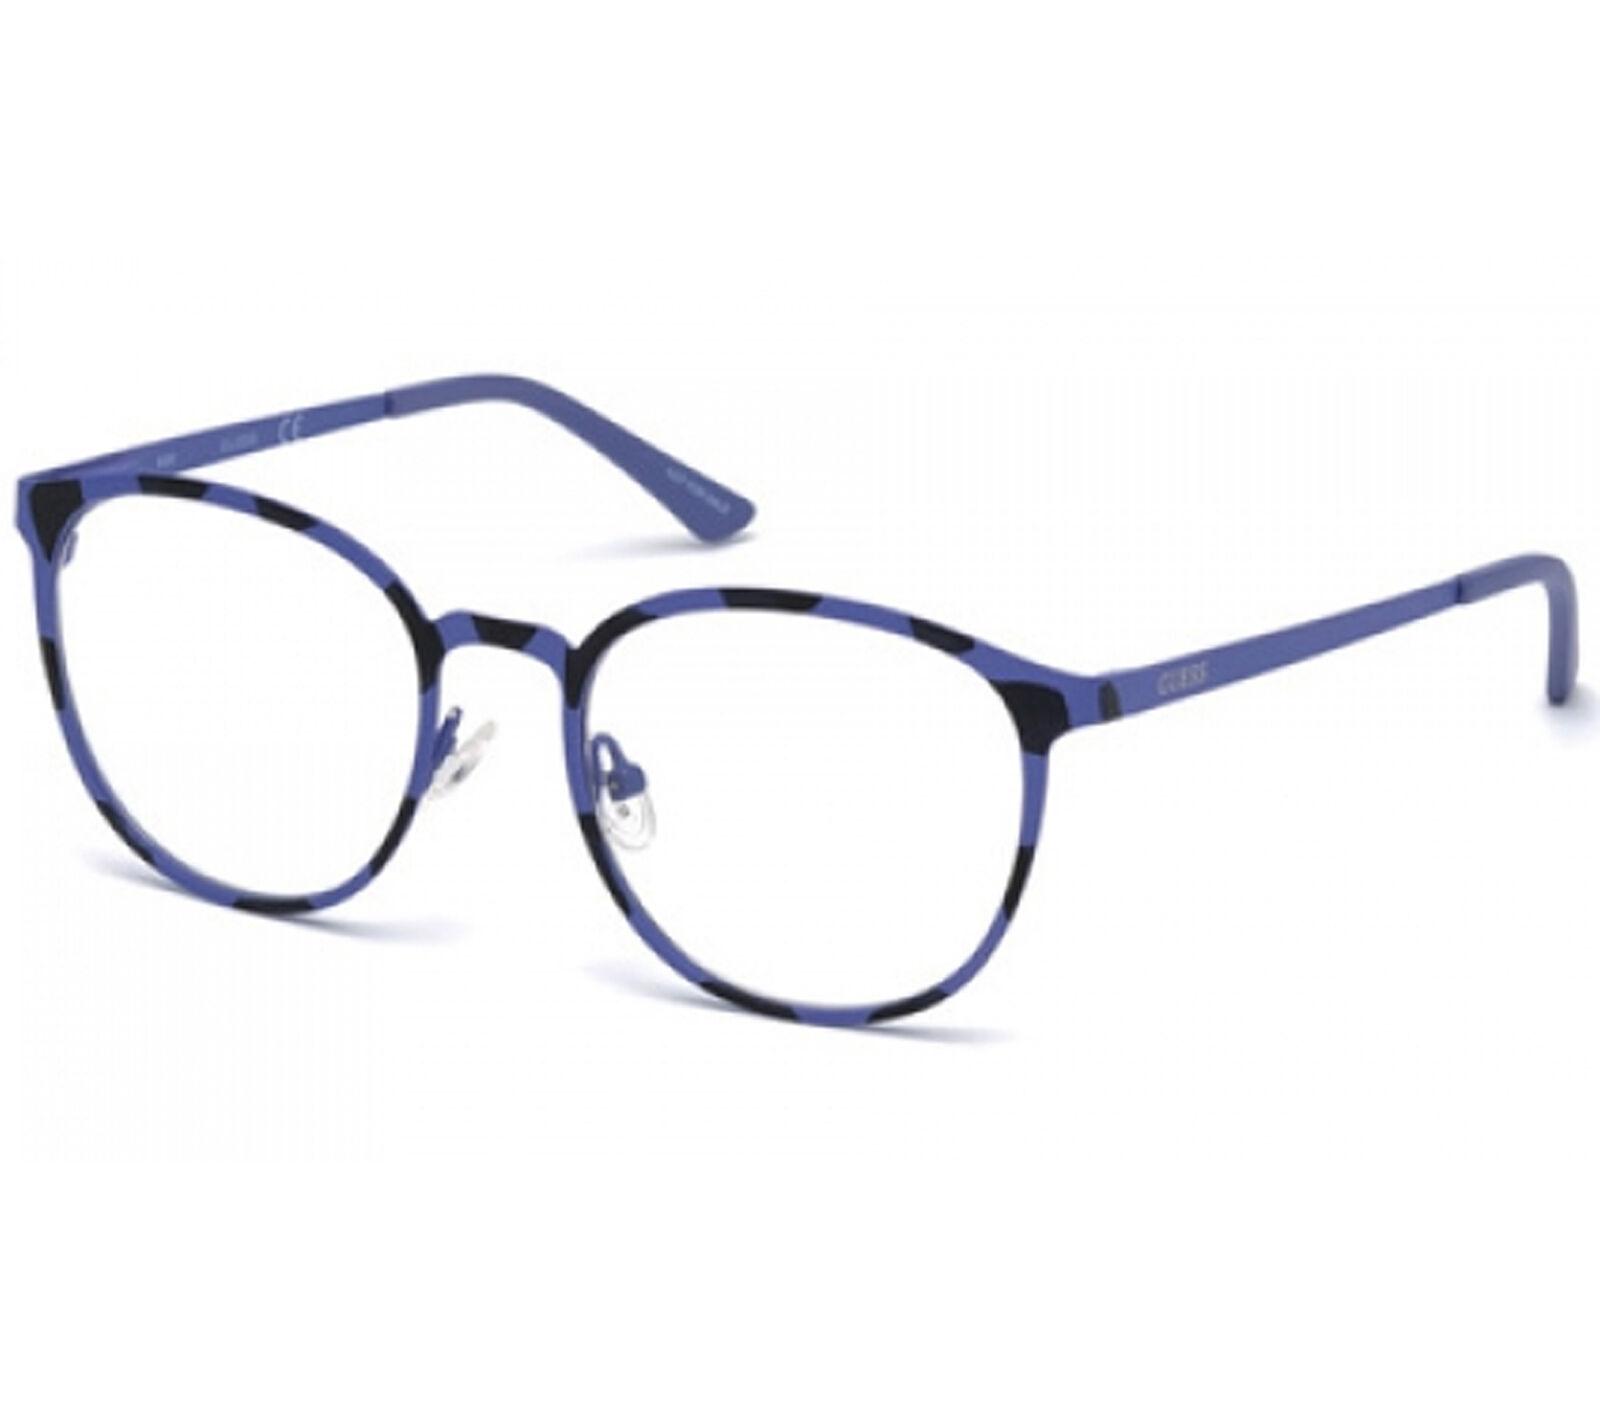 Guess Brille Blau